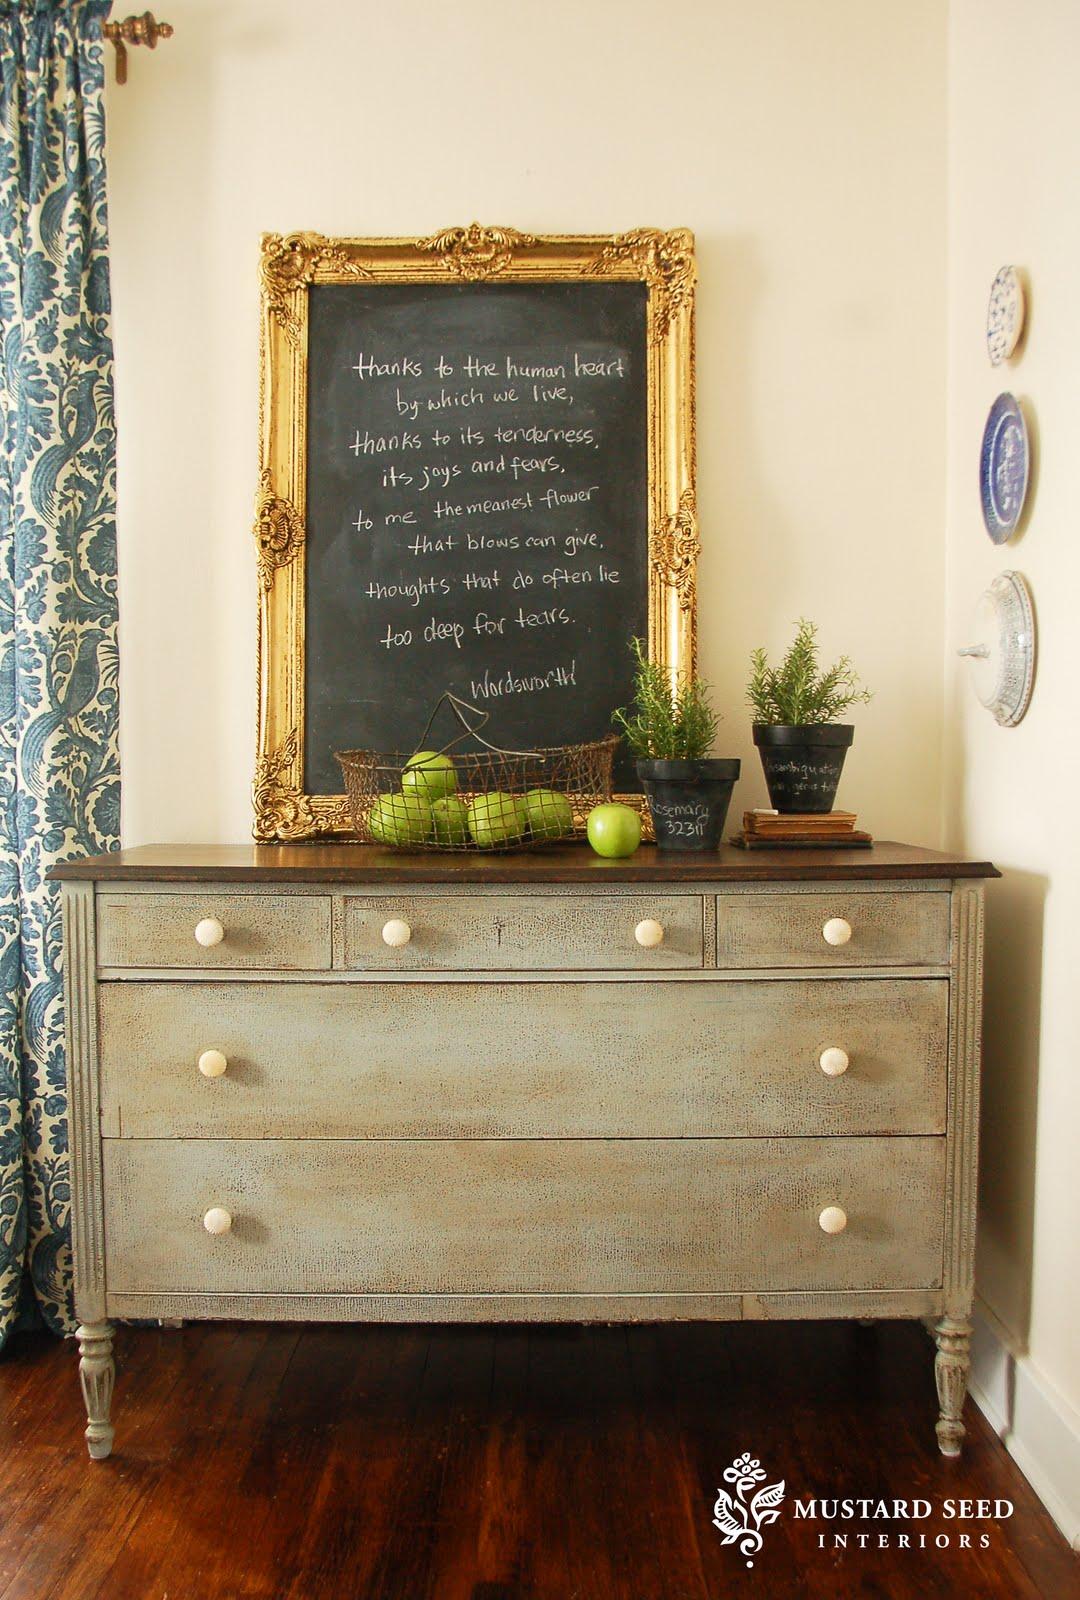 milk paint vs chalk paint miss mustard seed. Black Bedroom Furniture Sets. Home Design Ideas